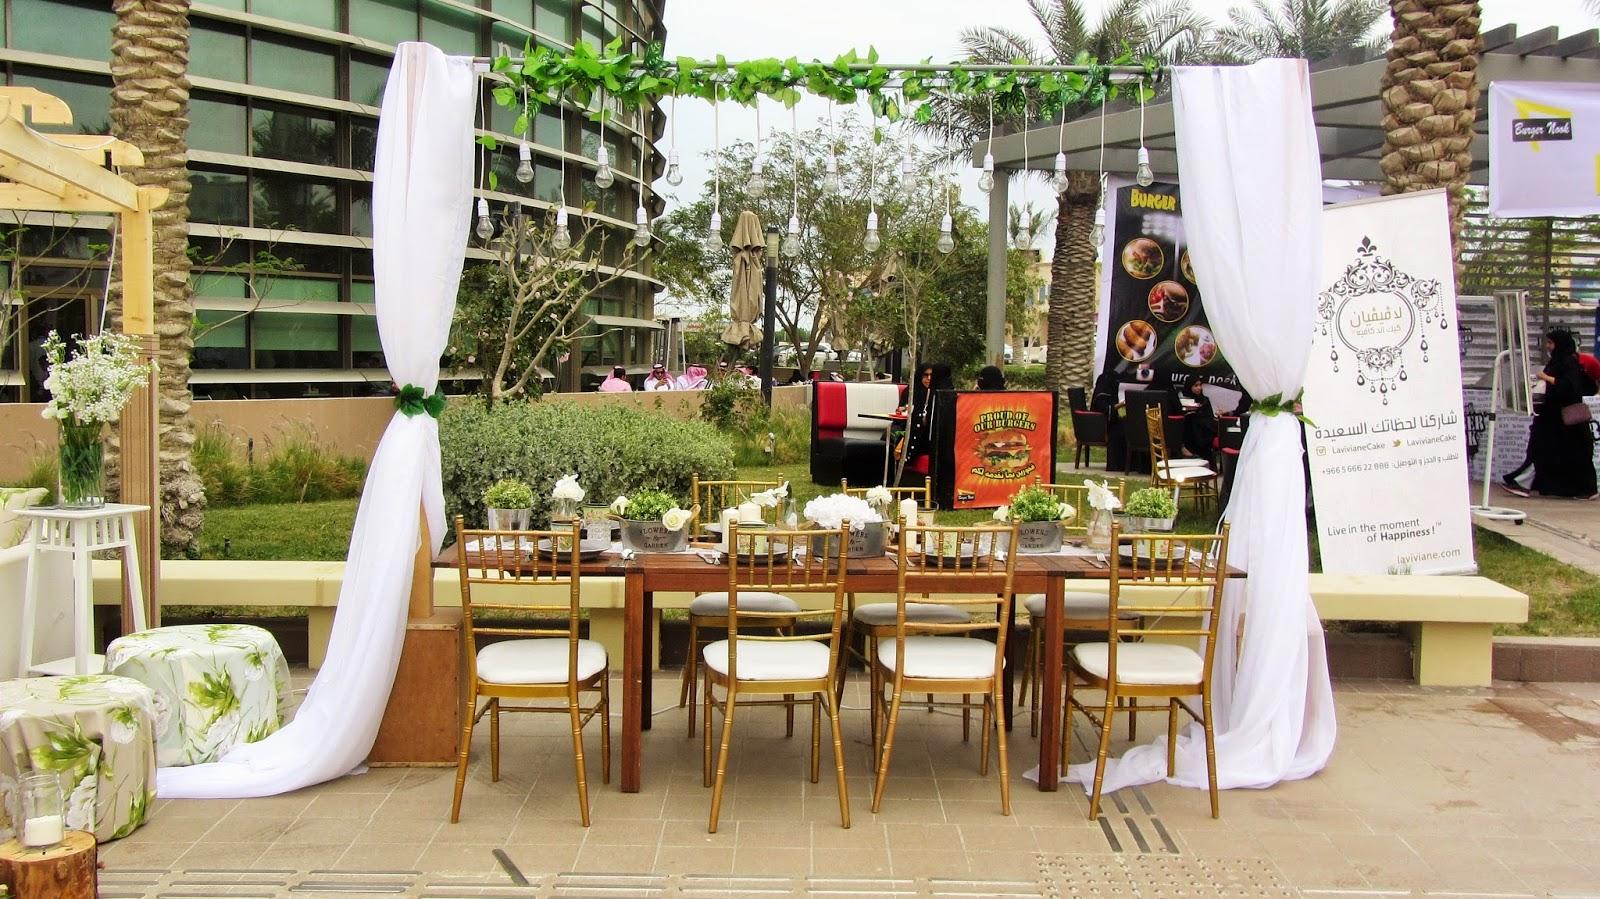 Mathaq Taste of Art Food Al-Khobar Saudi seating eating rental blog